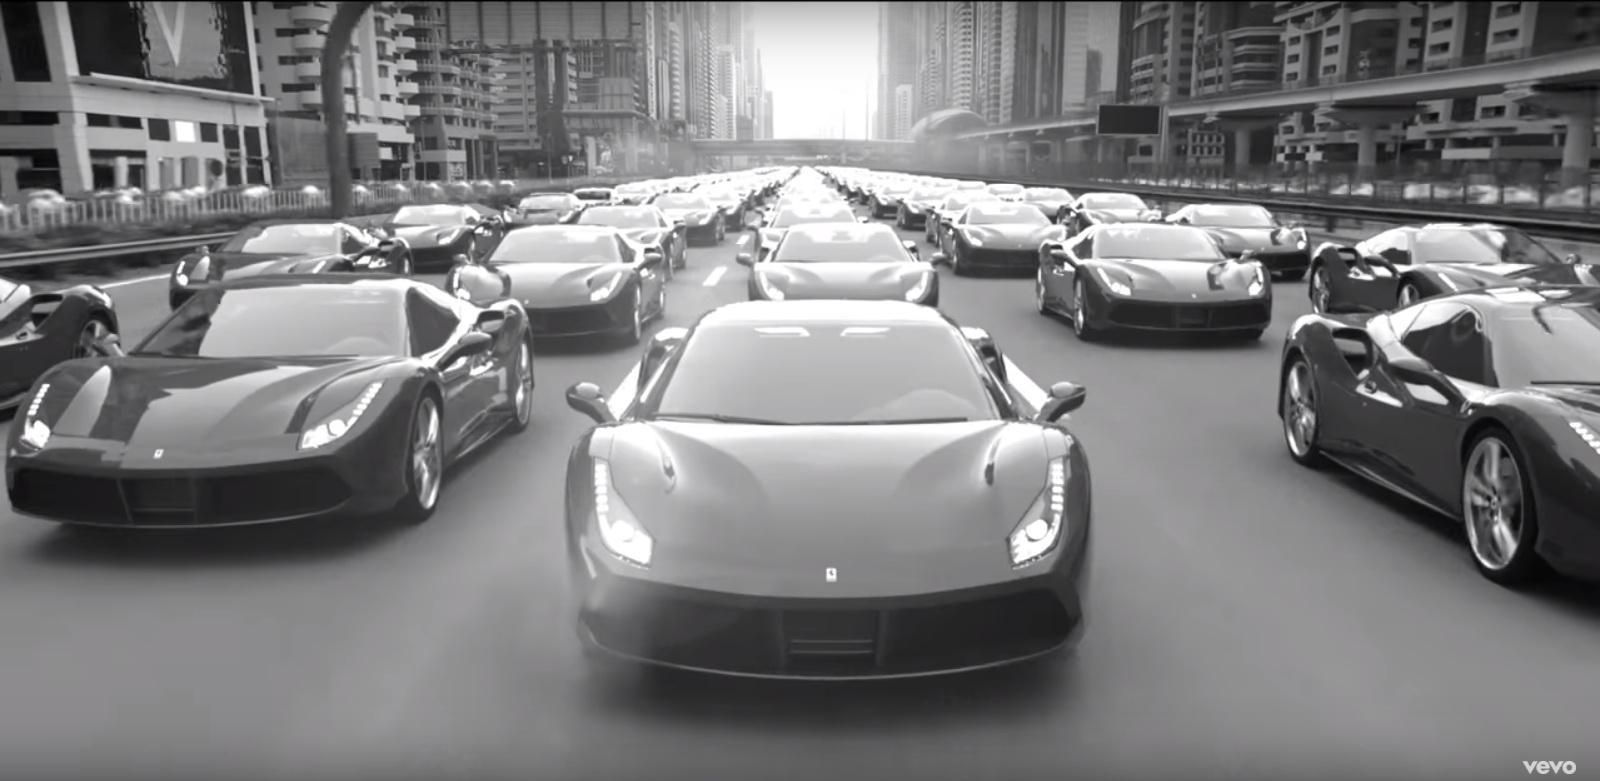 Ferrari 488 GTB - Imagine Dragons - Thunder - Official Music Video Product Placement